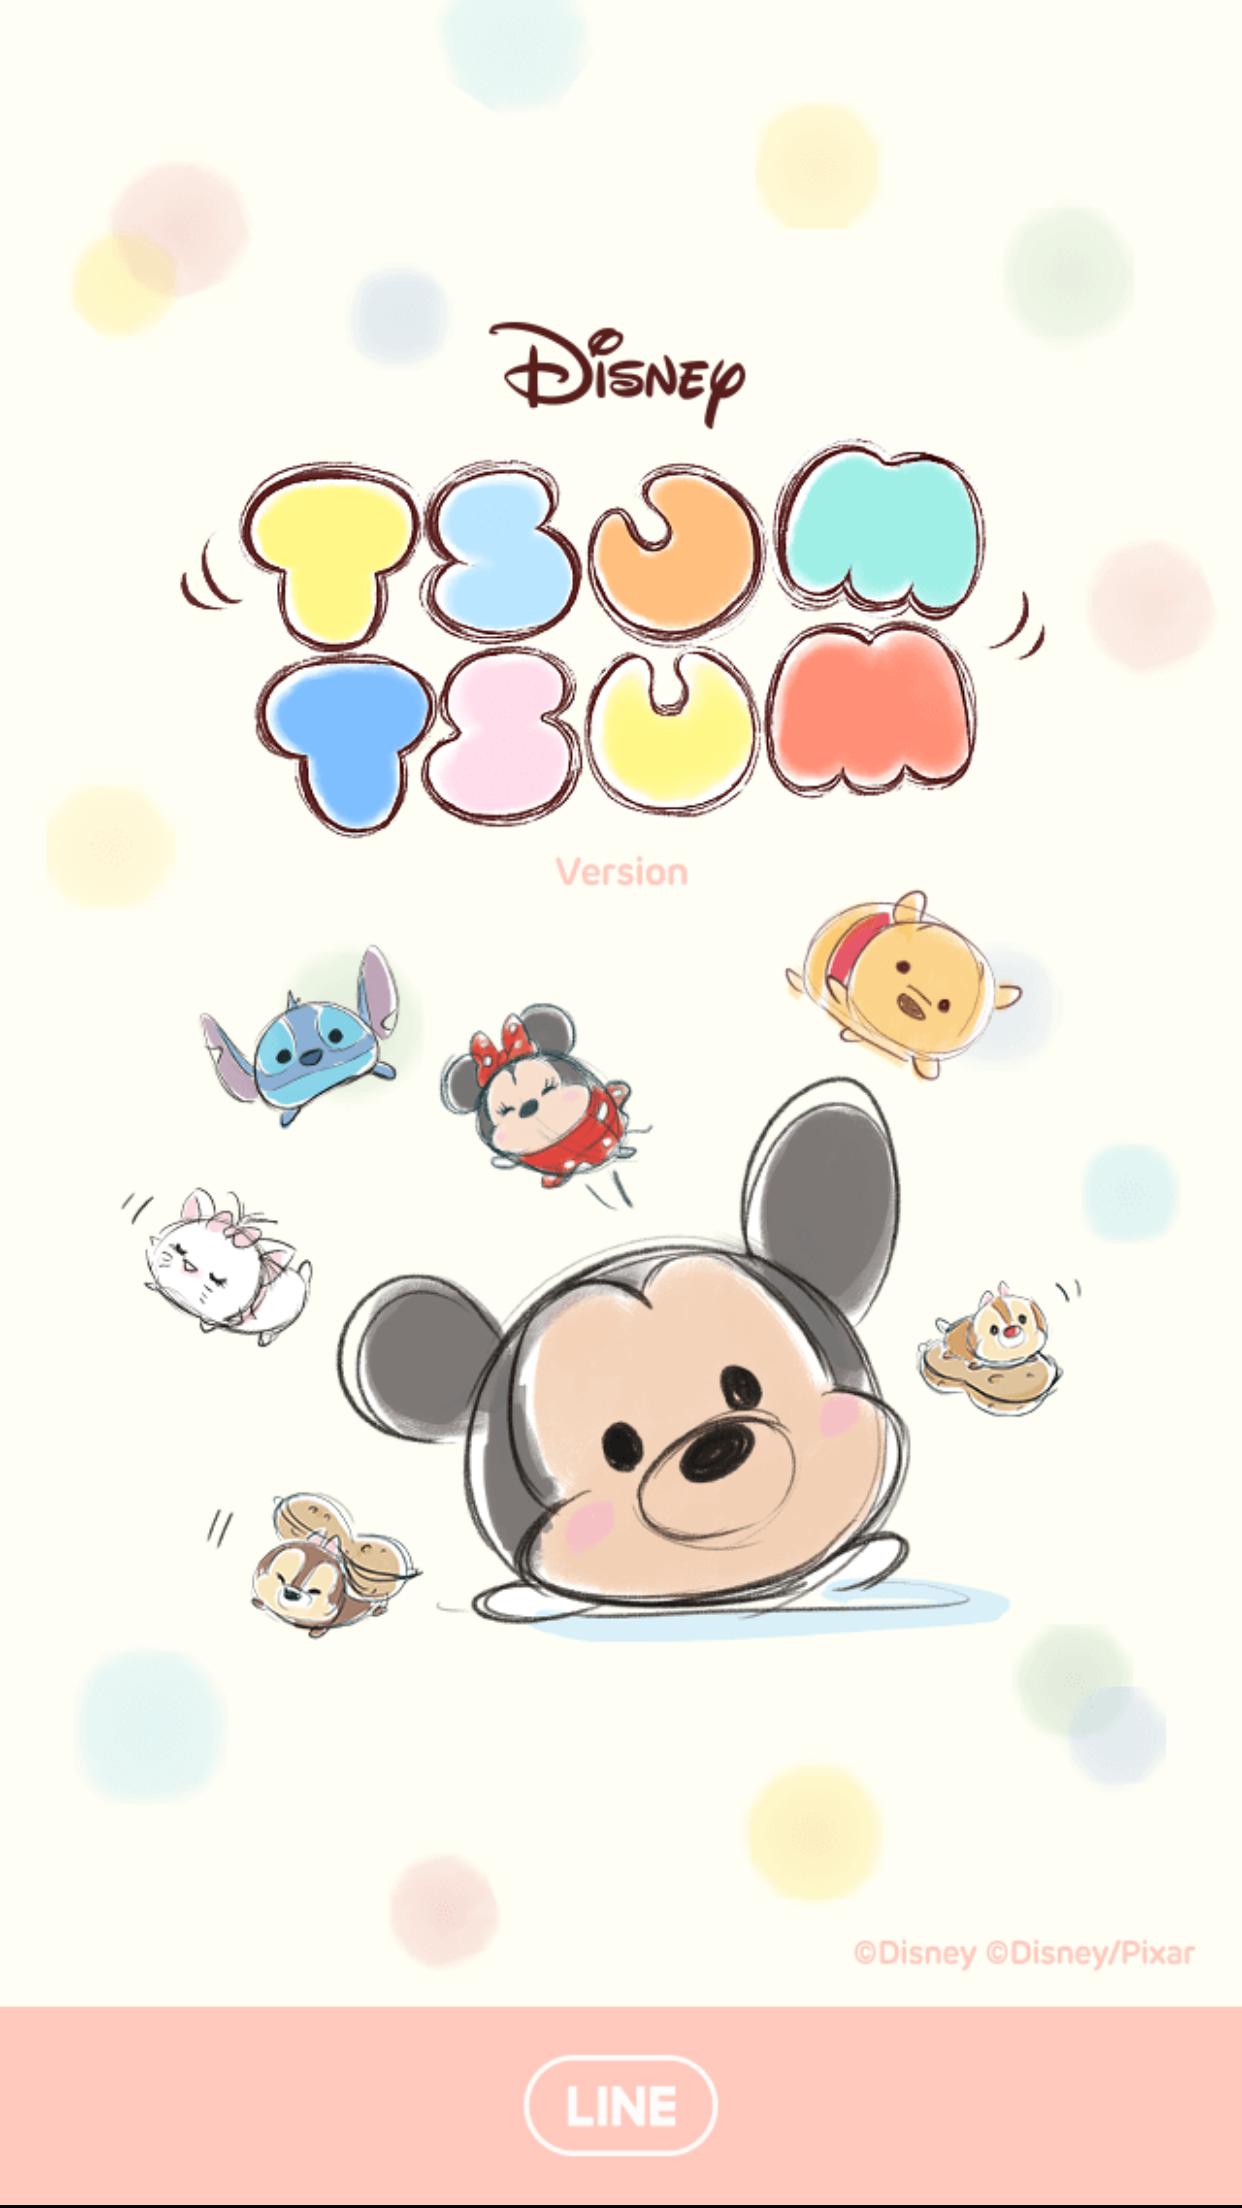 Pin By Wong Poh Yee On Winnie The Pooh N Friends Tsum Tsum Wallpaper Disney Tsum Tsum Disney Cuties